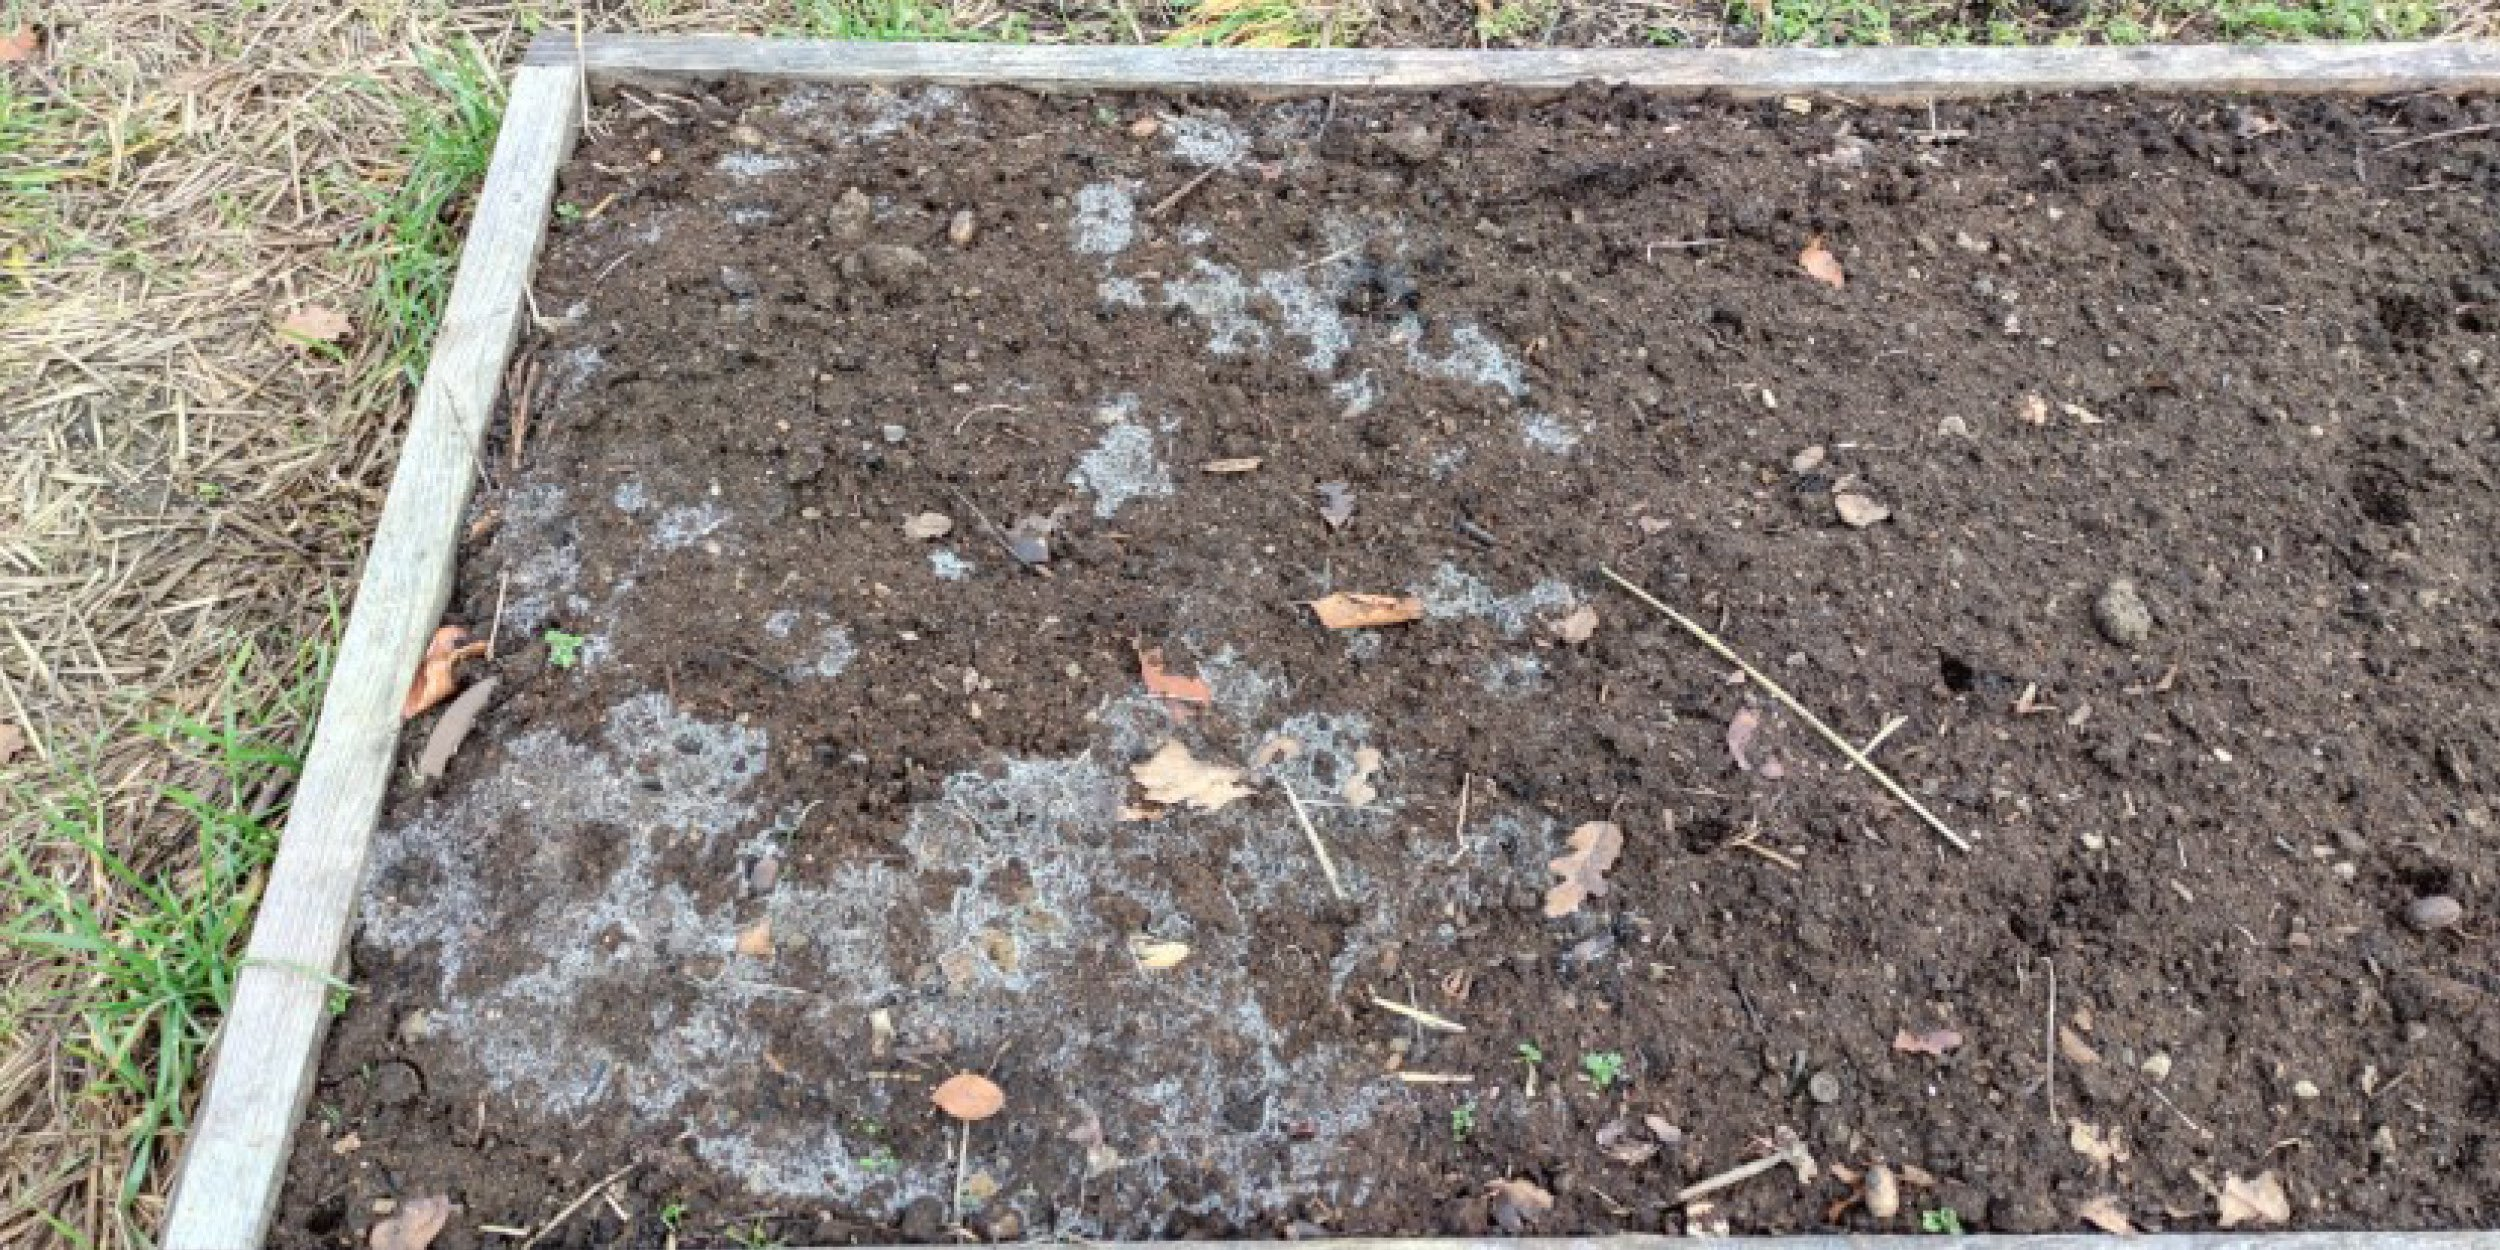 White Mold on The Garden Beam